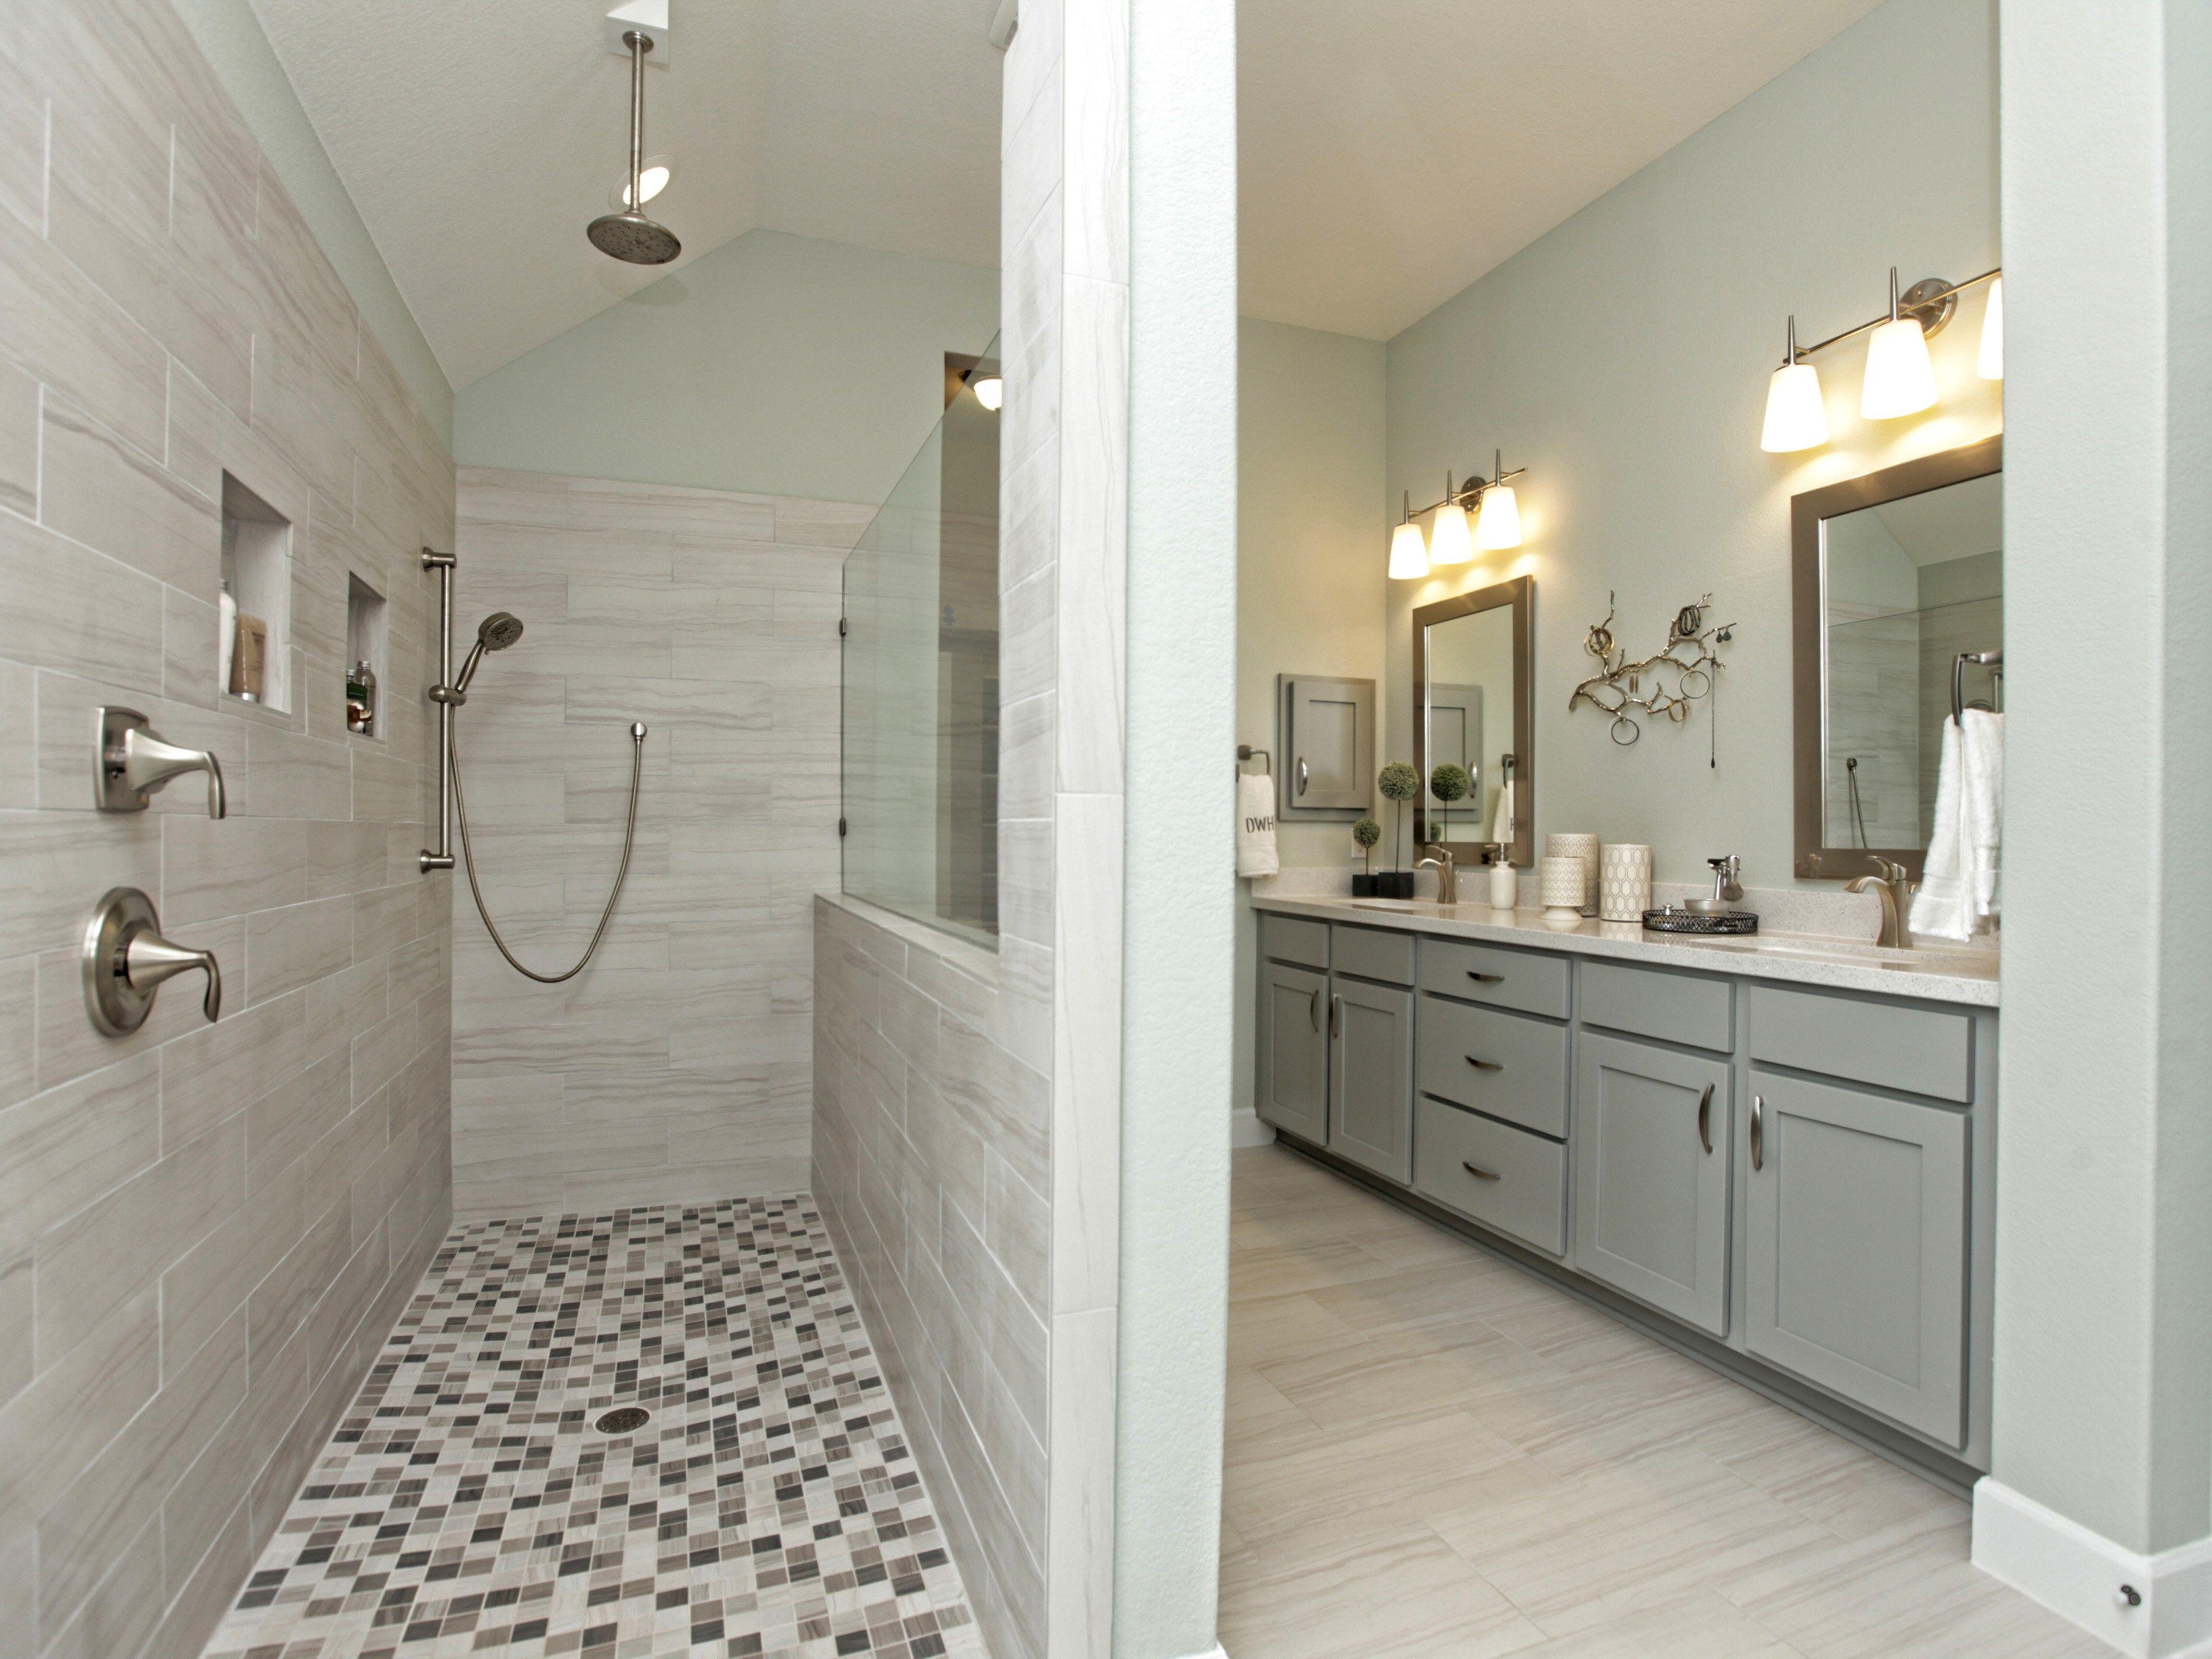 Master Bedroom Bathroom At The David Weekley Model Look At That Walk In Shower Bathroom Remodel Master Dream Bathroom Master Baths Bathroom Layout